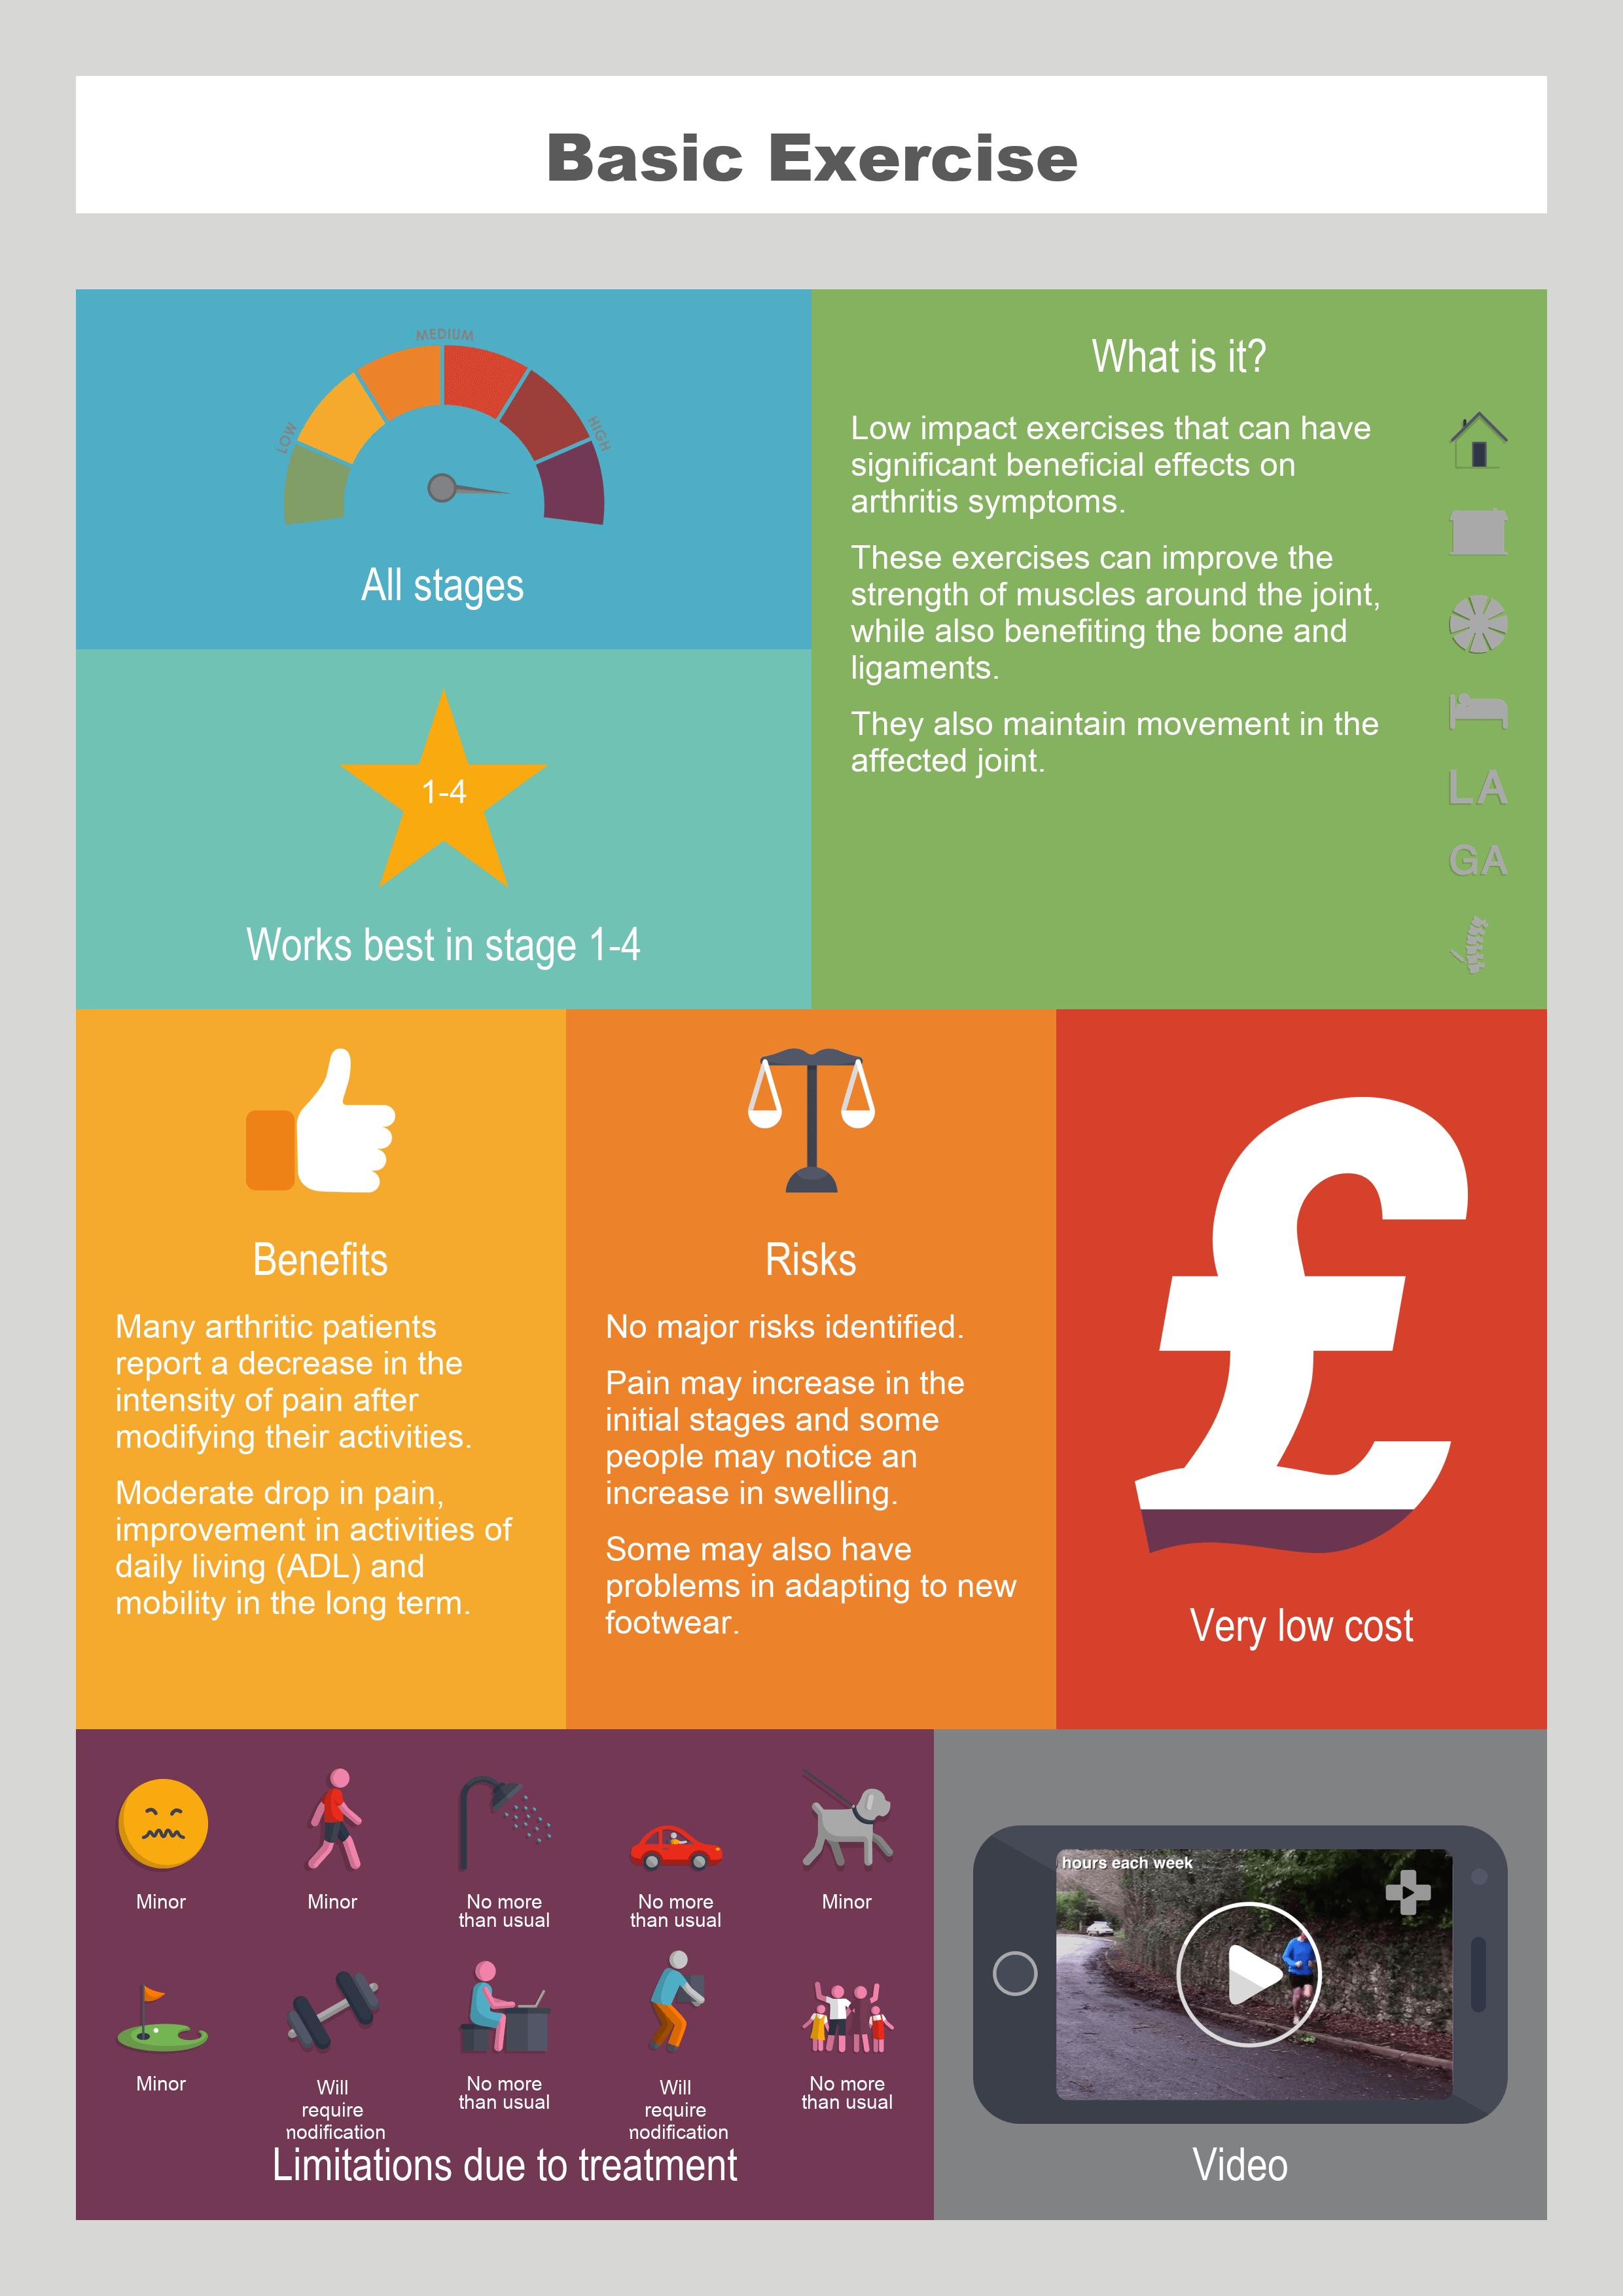 Basic Exercise info graphic